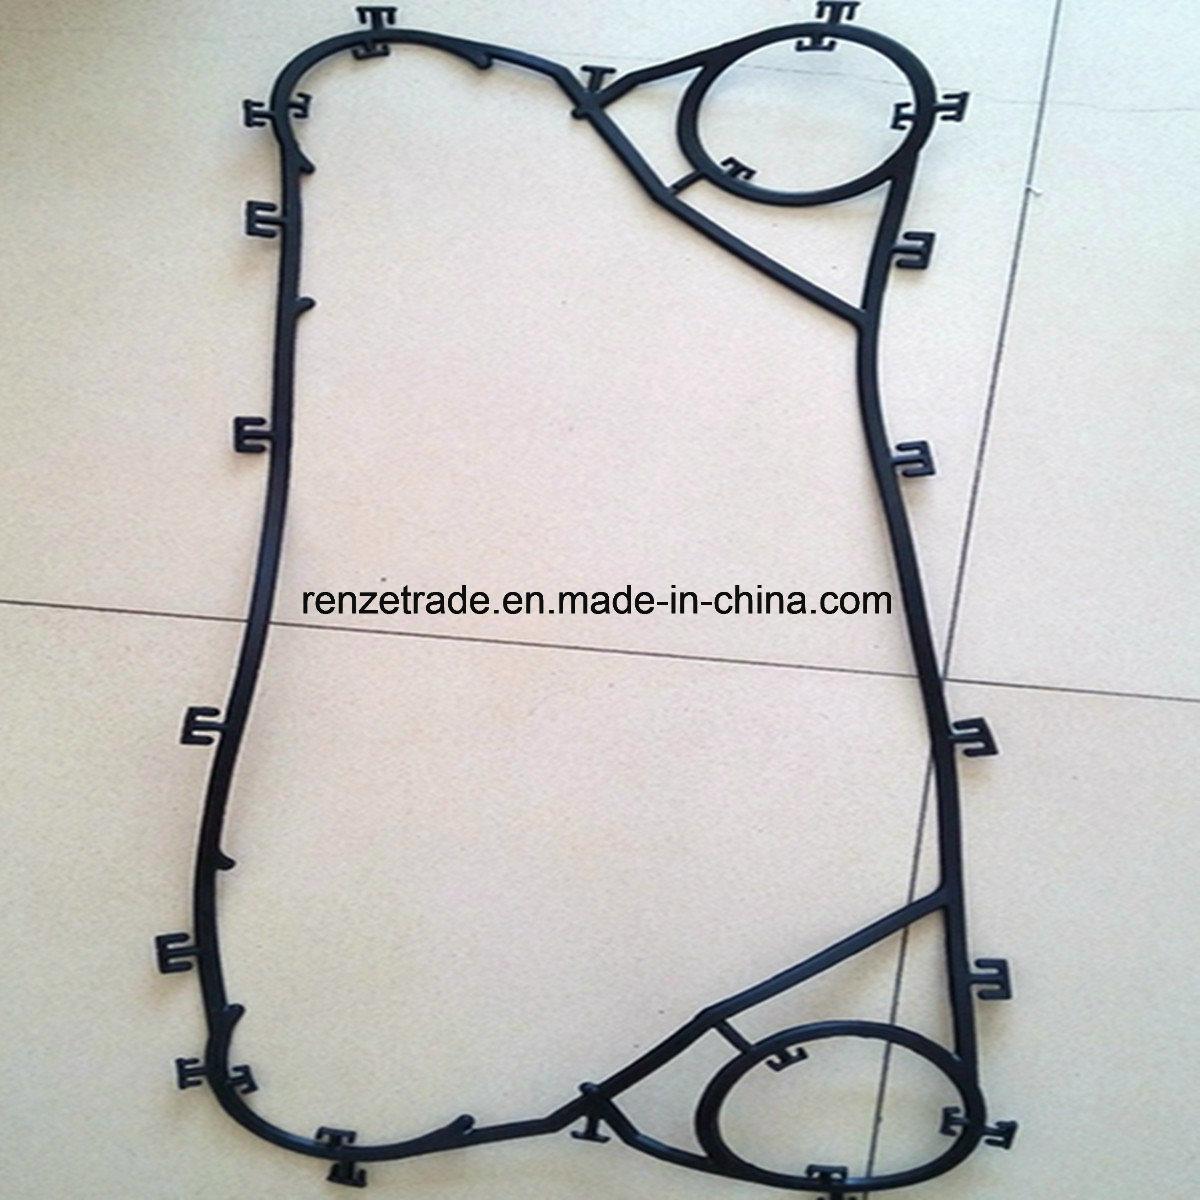 Plate Heat Exchanger Spare Parts NBR, EPDM, FPM Flow Chanel Gasket